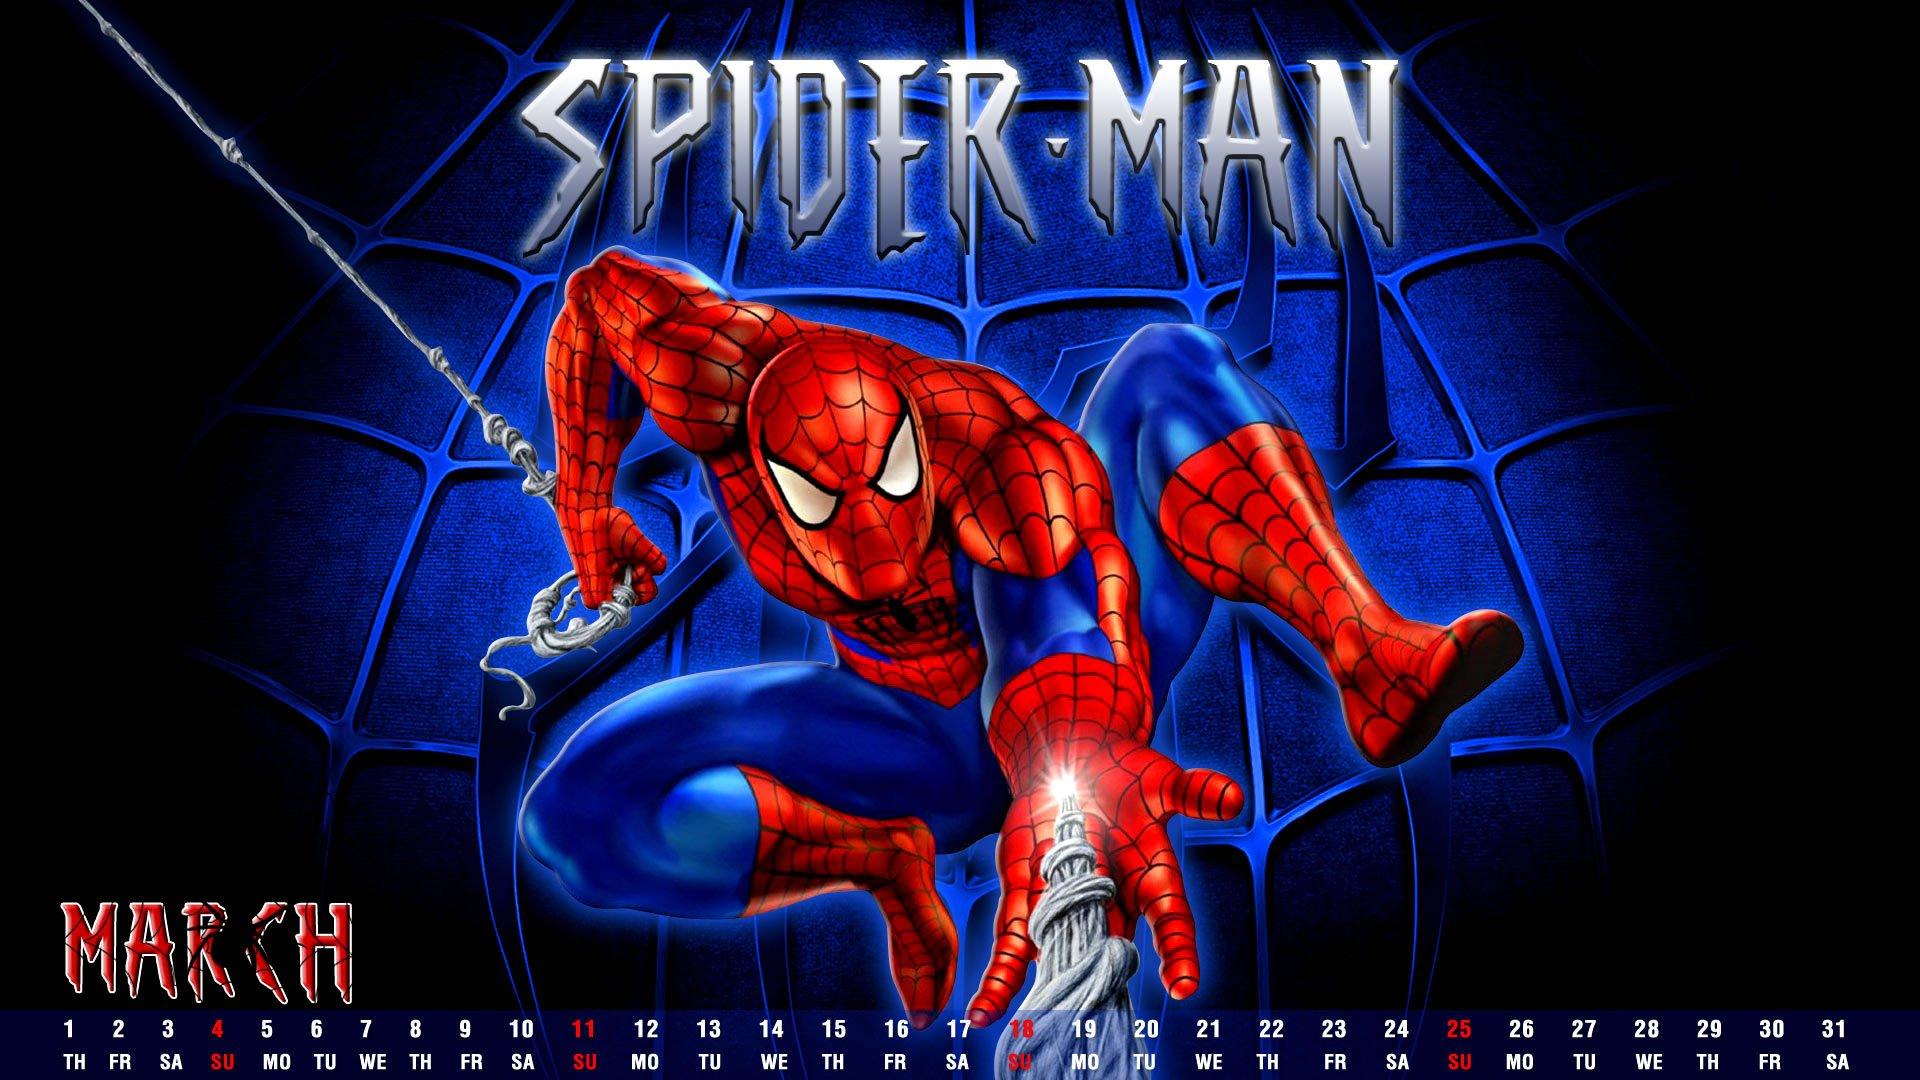 Wallpaper Calendar Superhero : Spider man superhero marvel action spiderman